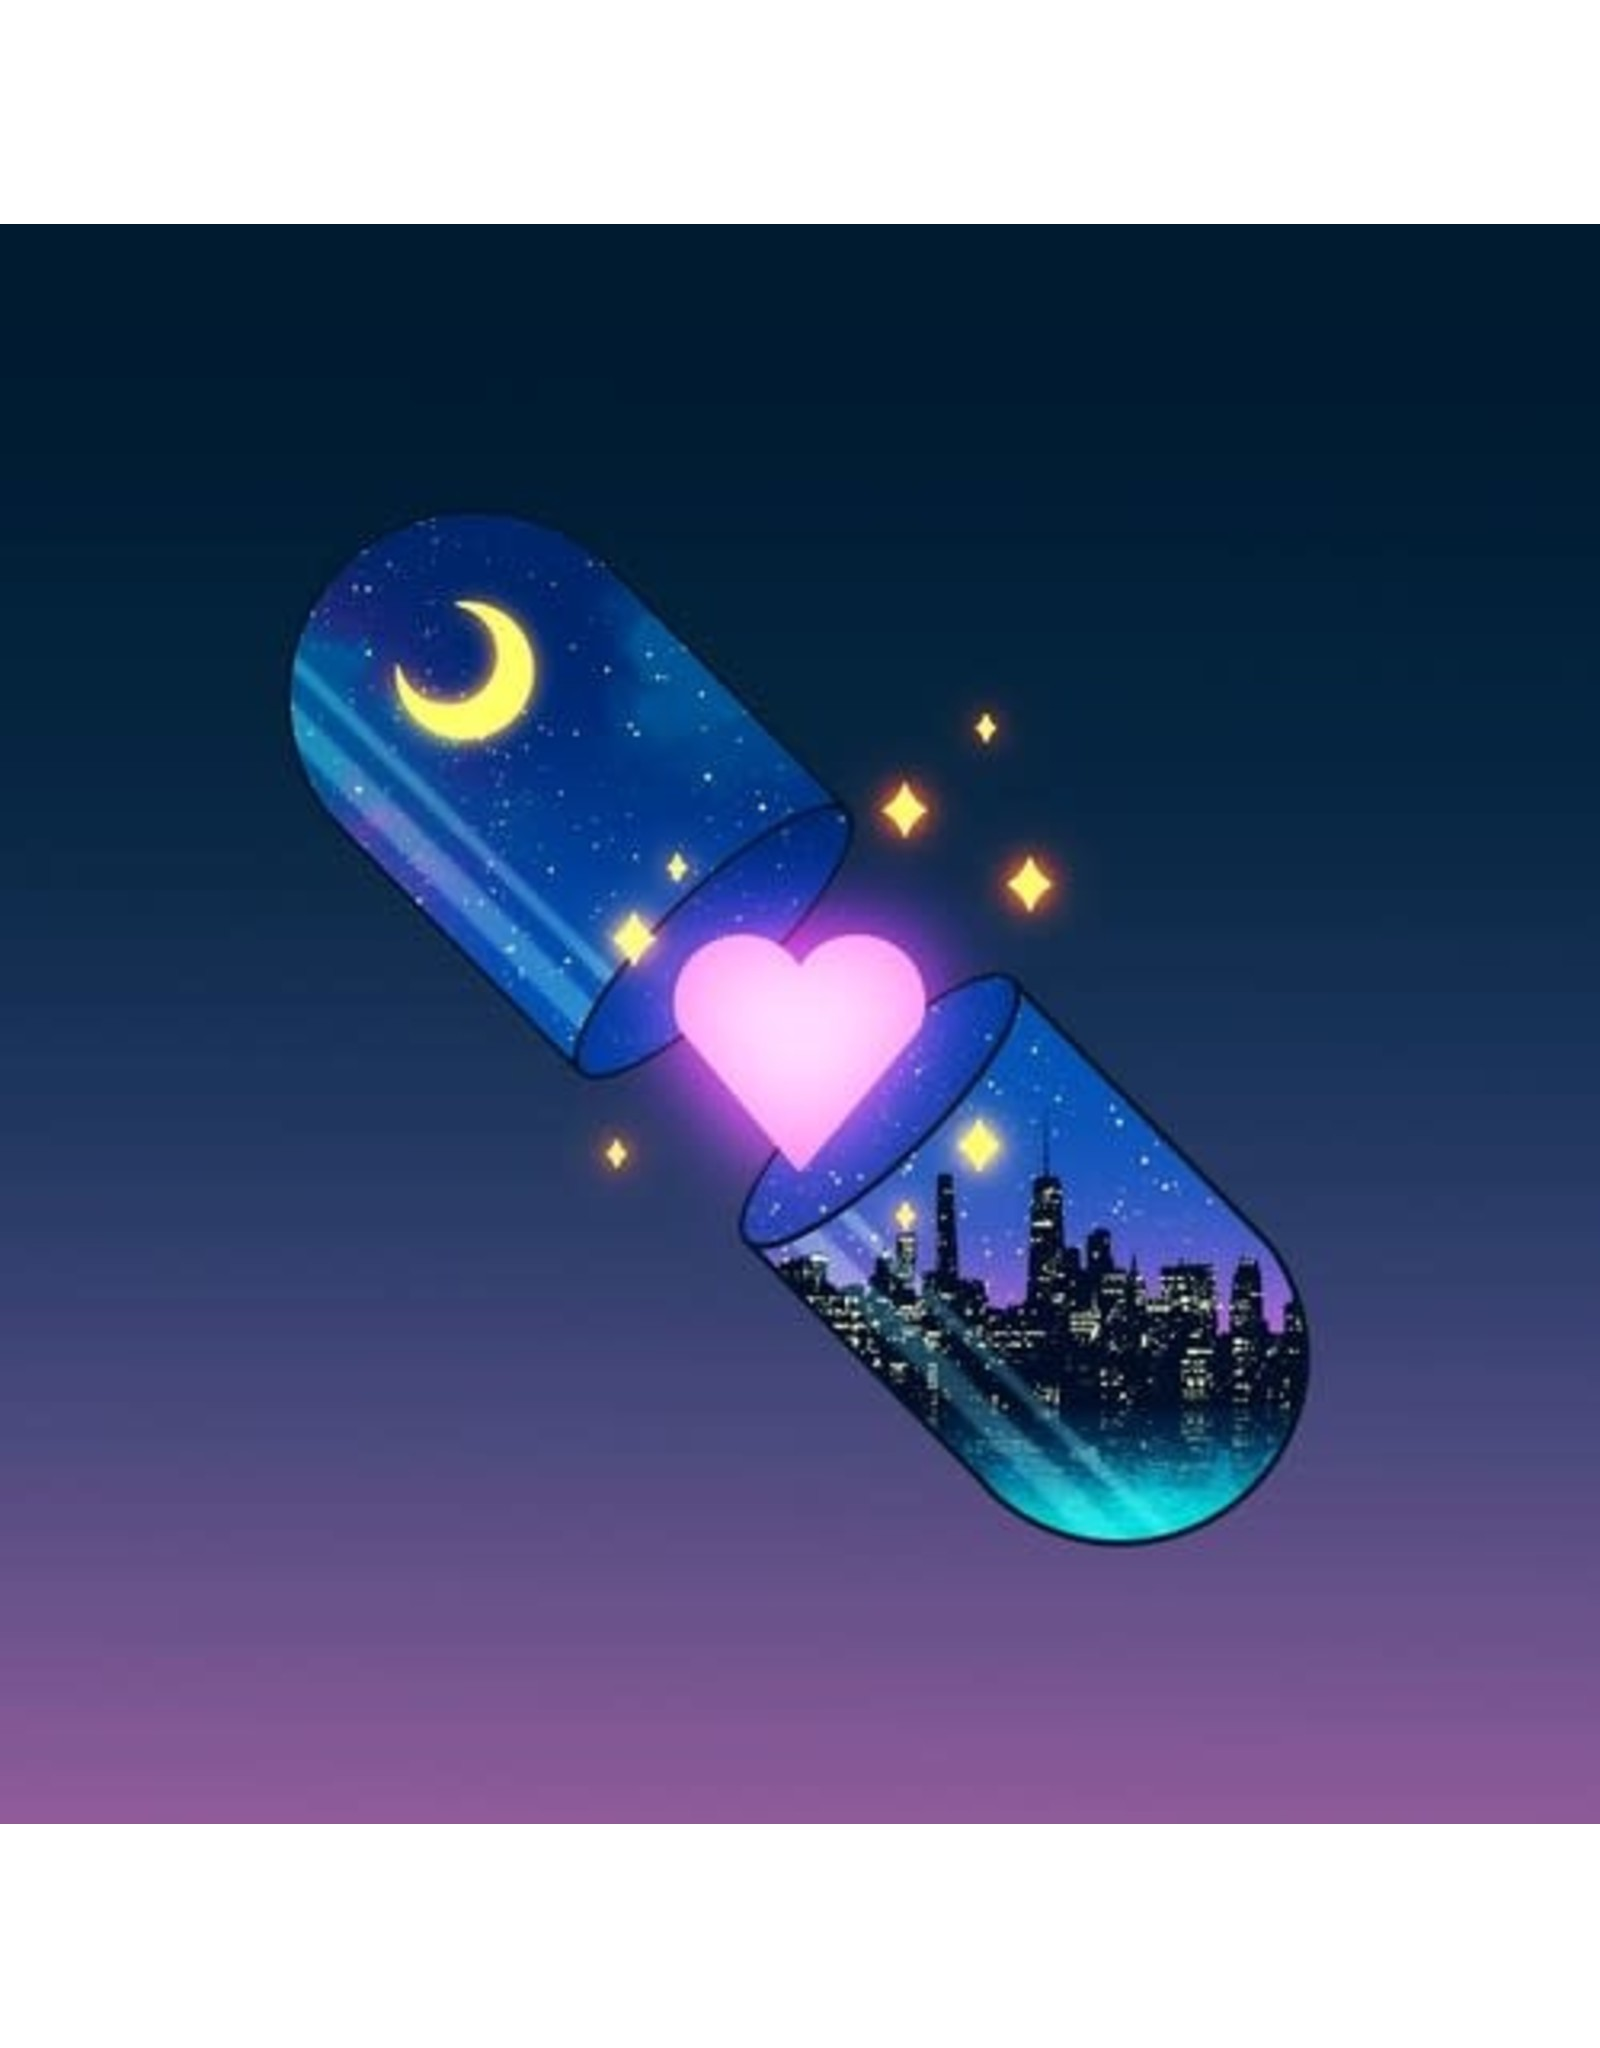 New Vinyl The Vaccines - Back In Love City LP